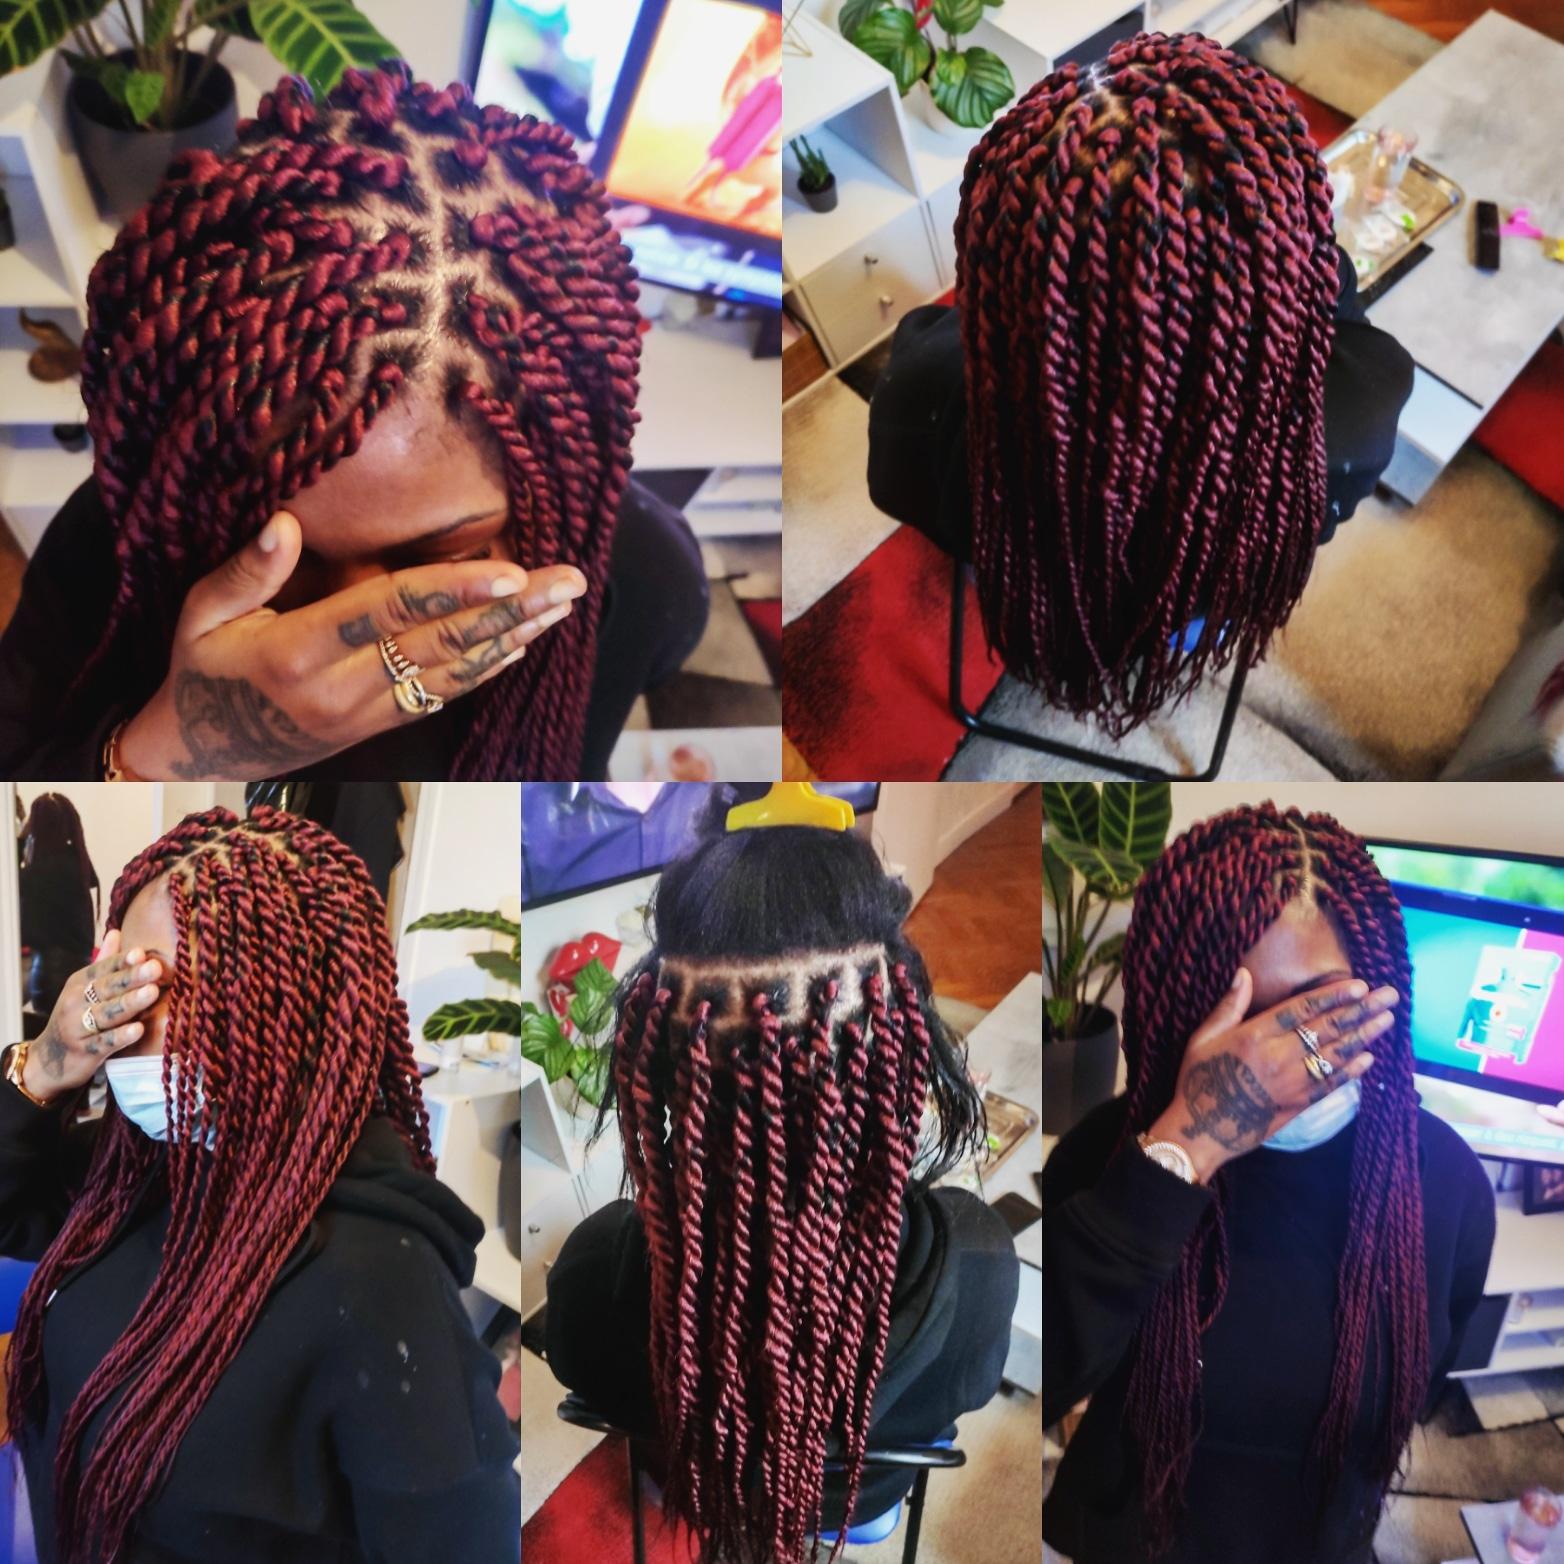 salon de coiffure afro tresse tresses box braids crochet braids vanilles tissages paris 75 77 78 91 92 93 94 95 QOXXAZVA